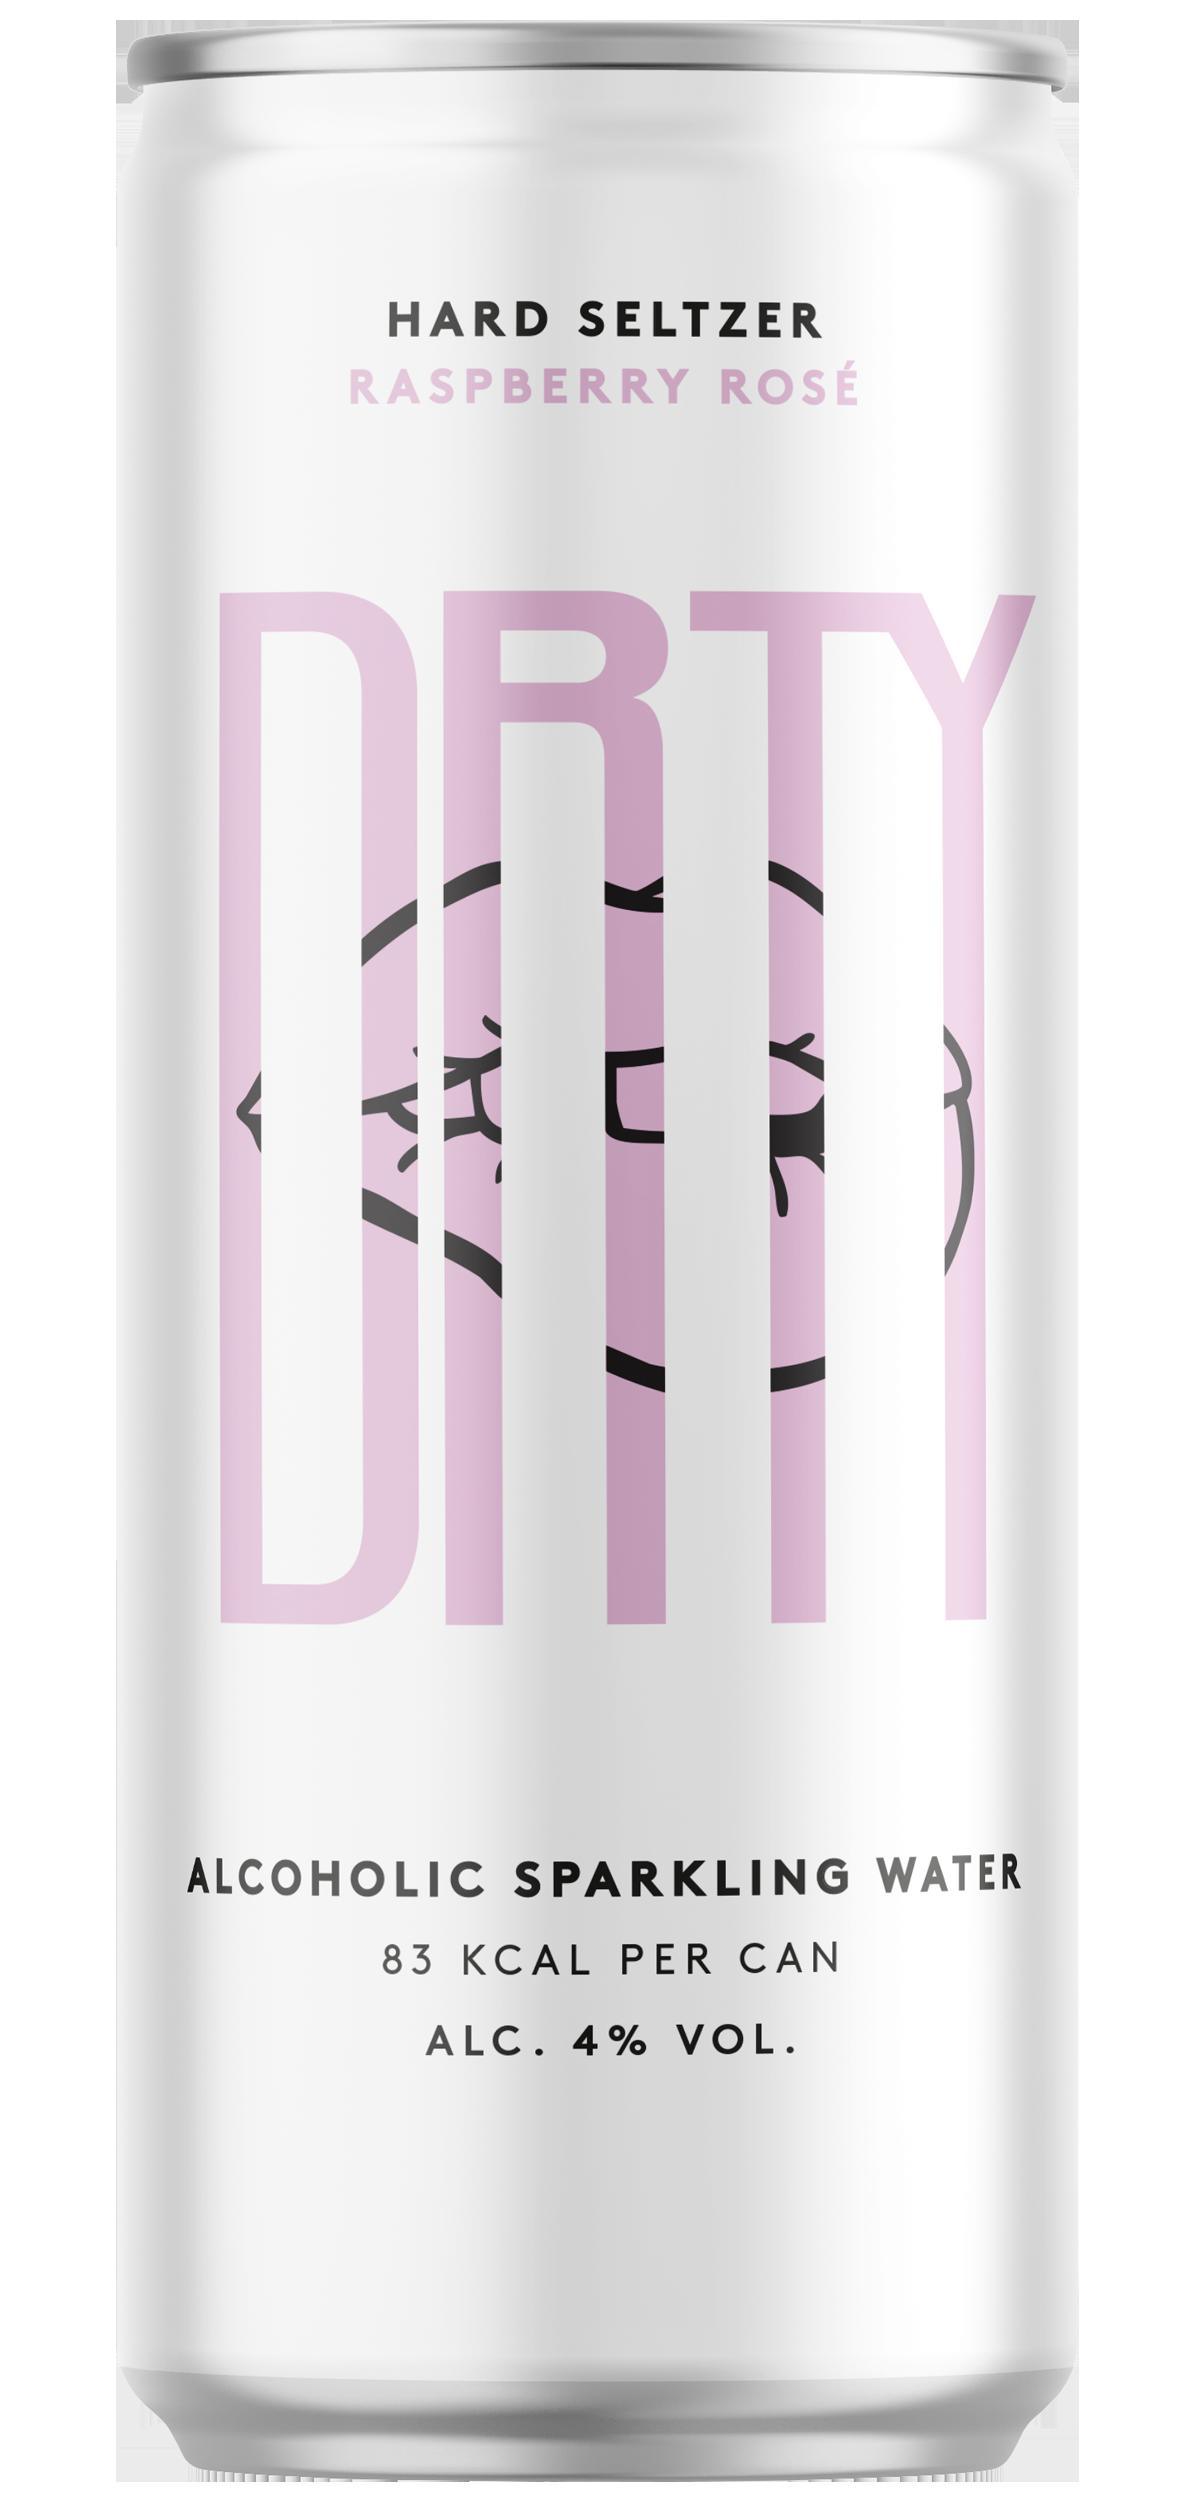 DRTY Raspberry Rosé